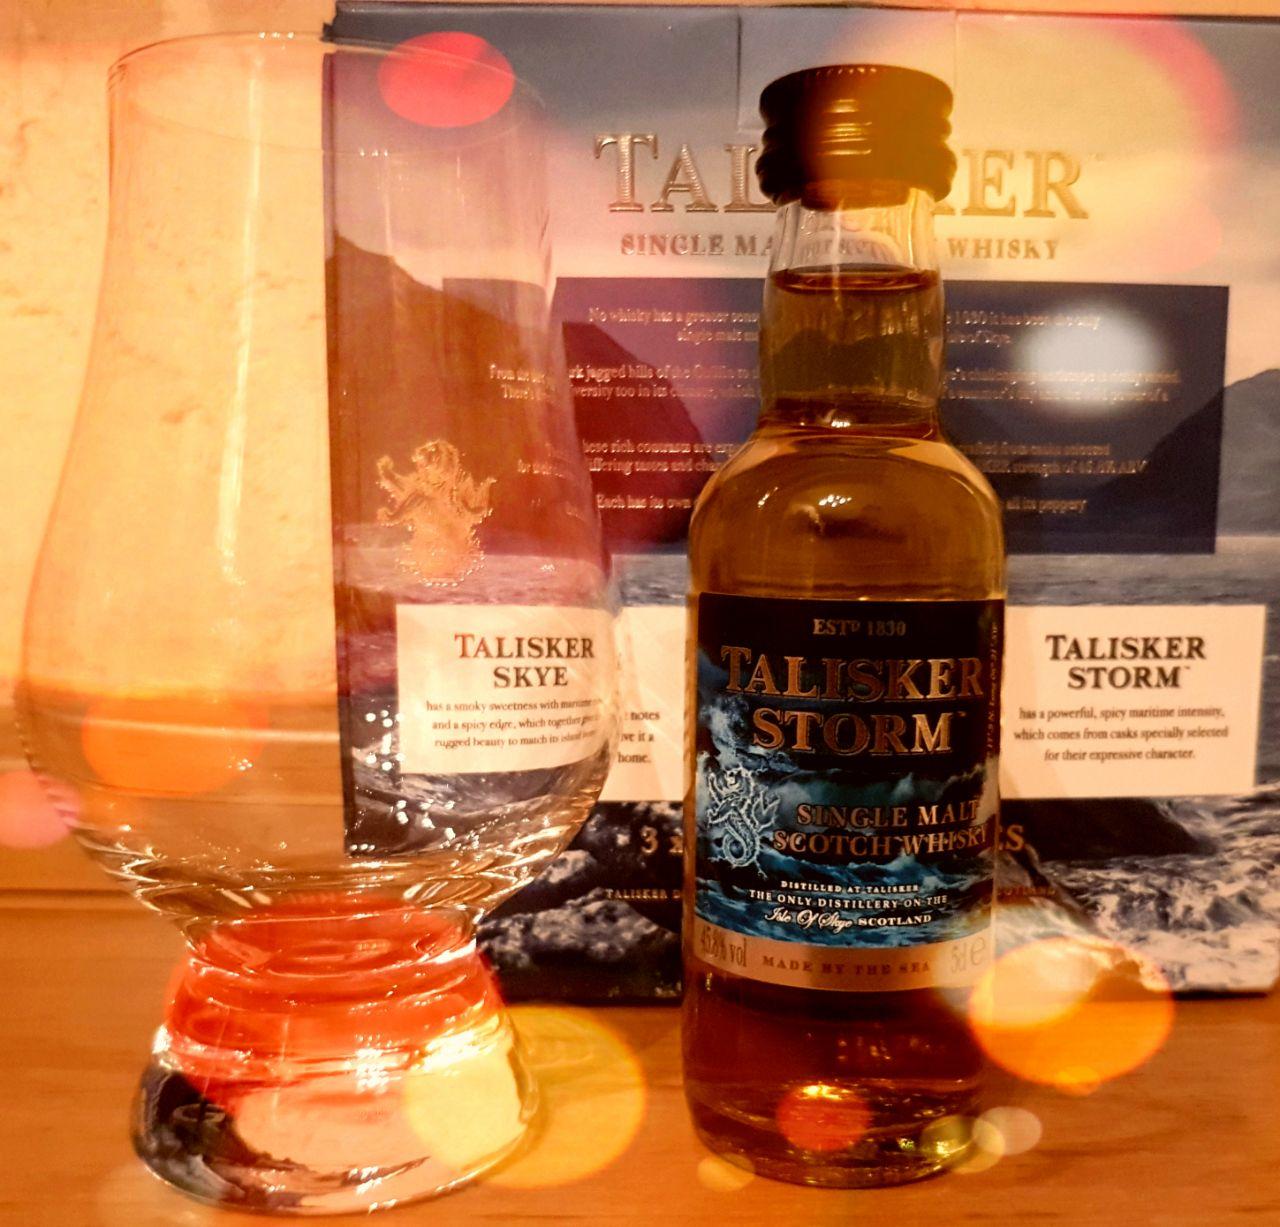 Talisker Storm Islay Single Malt Scotch Whisky